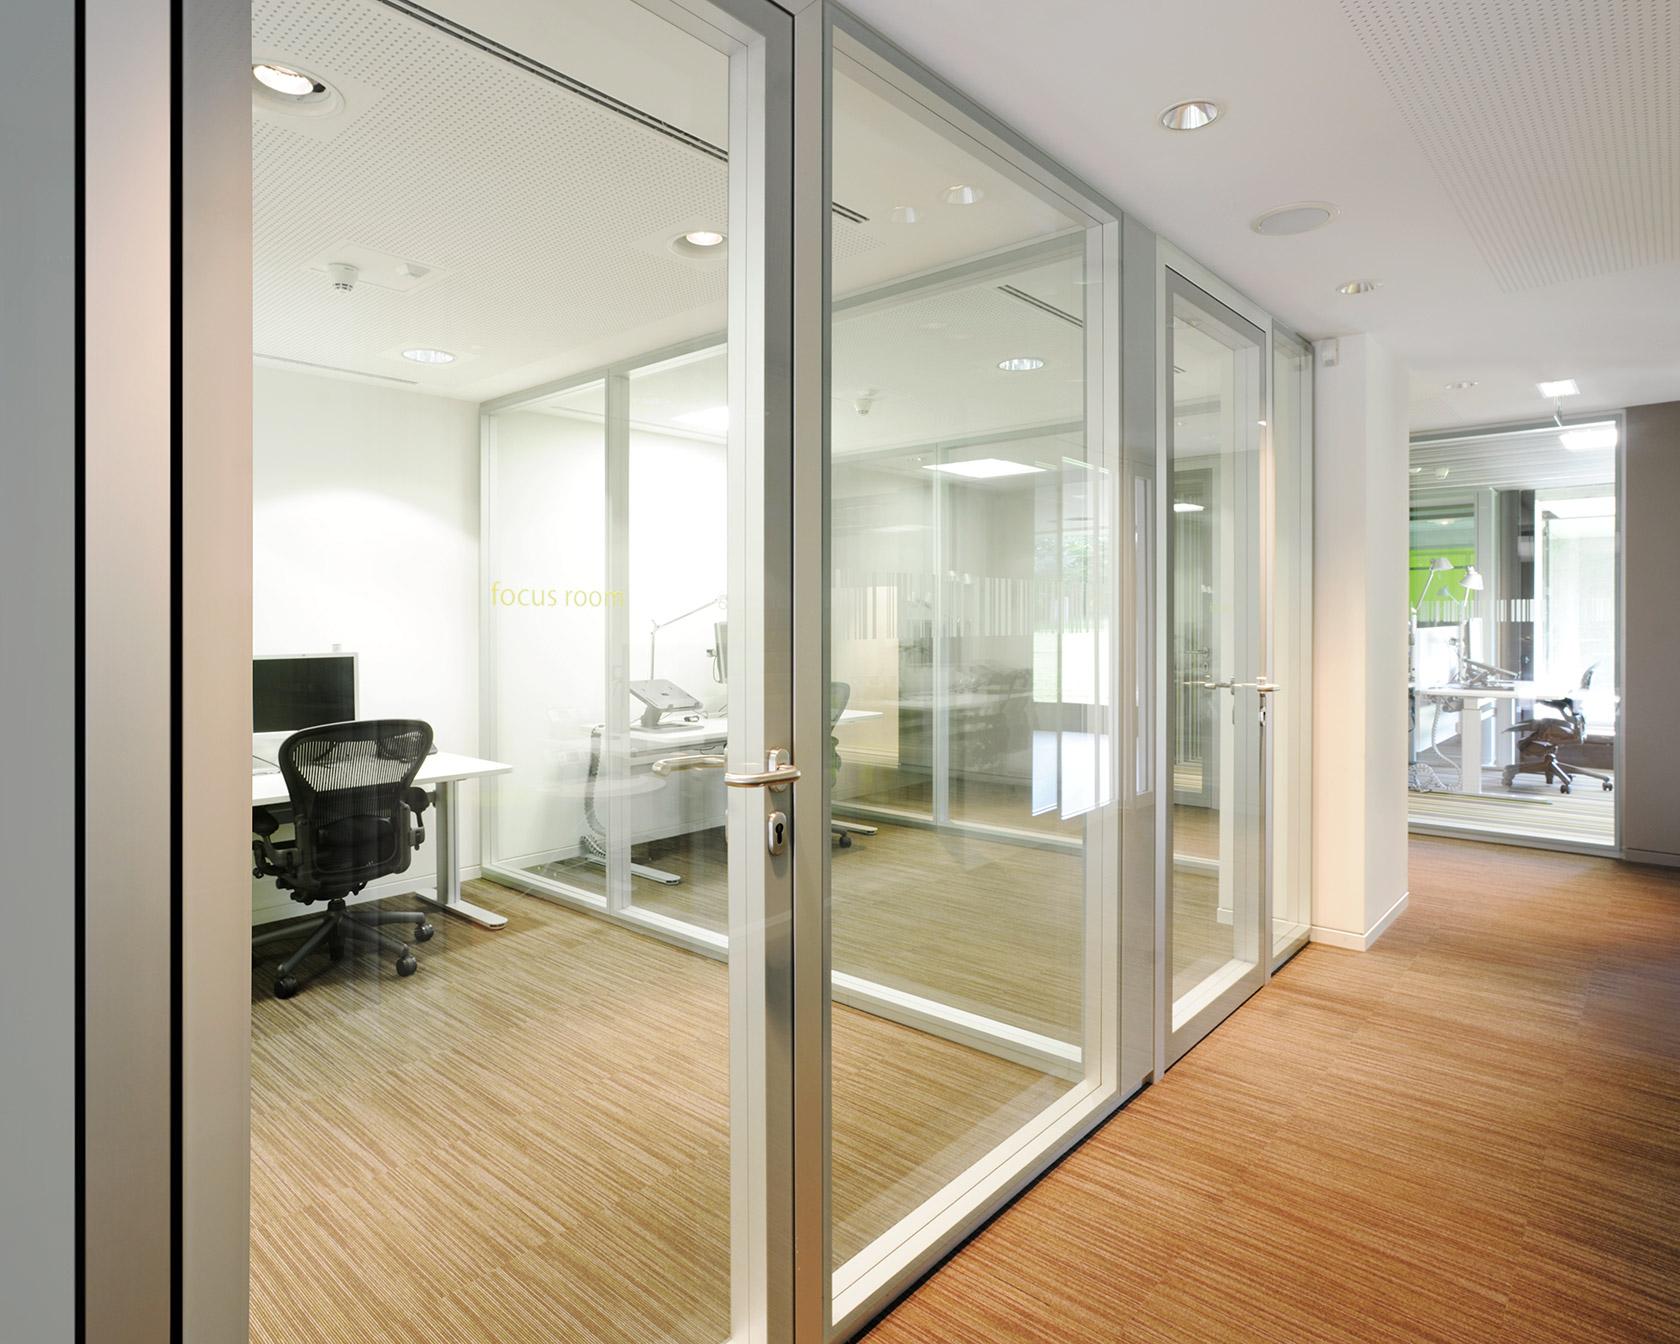 eib luxemburg str hle raum systeme. Black Bedroom Furniture Sets. Home Design Ideas